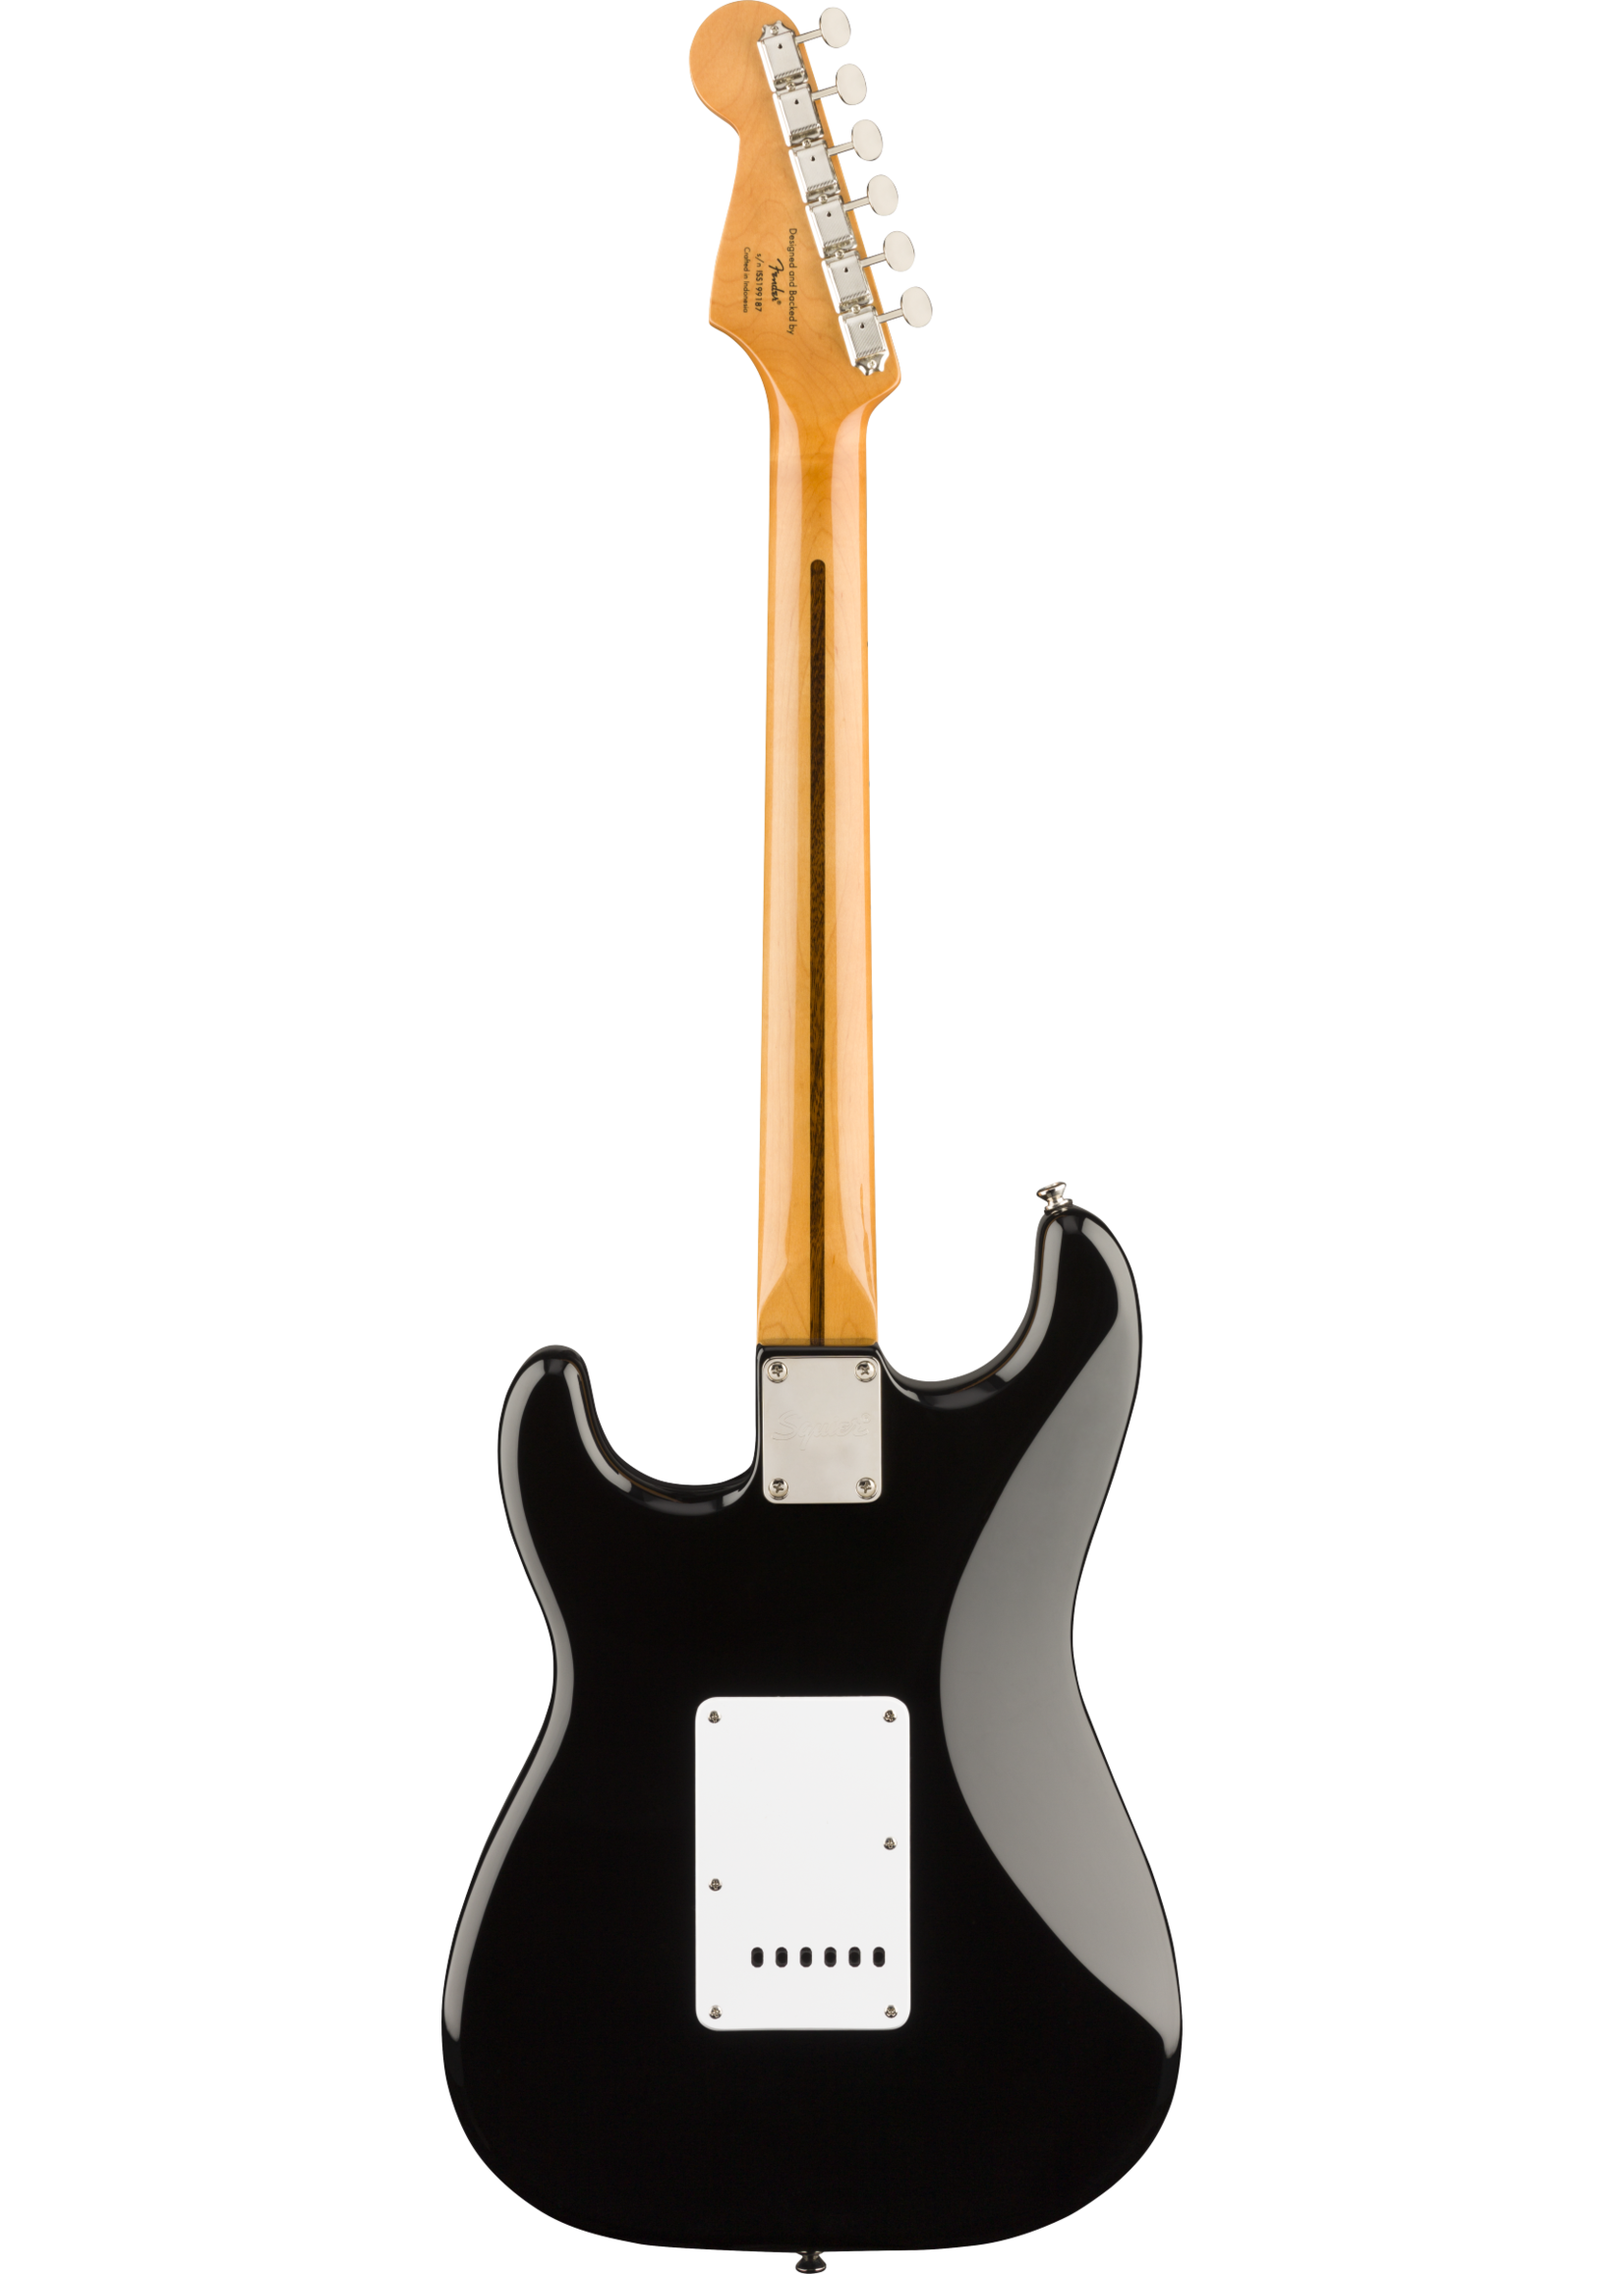 Squier Squier Classic Vibe '50s Stratocaster Black Maple Fretboard